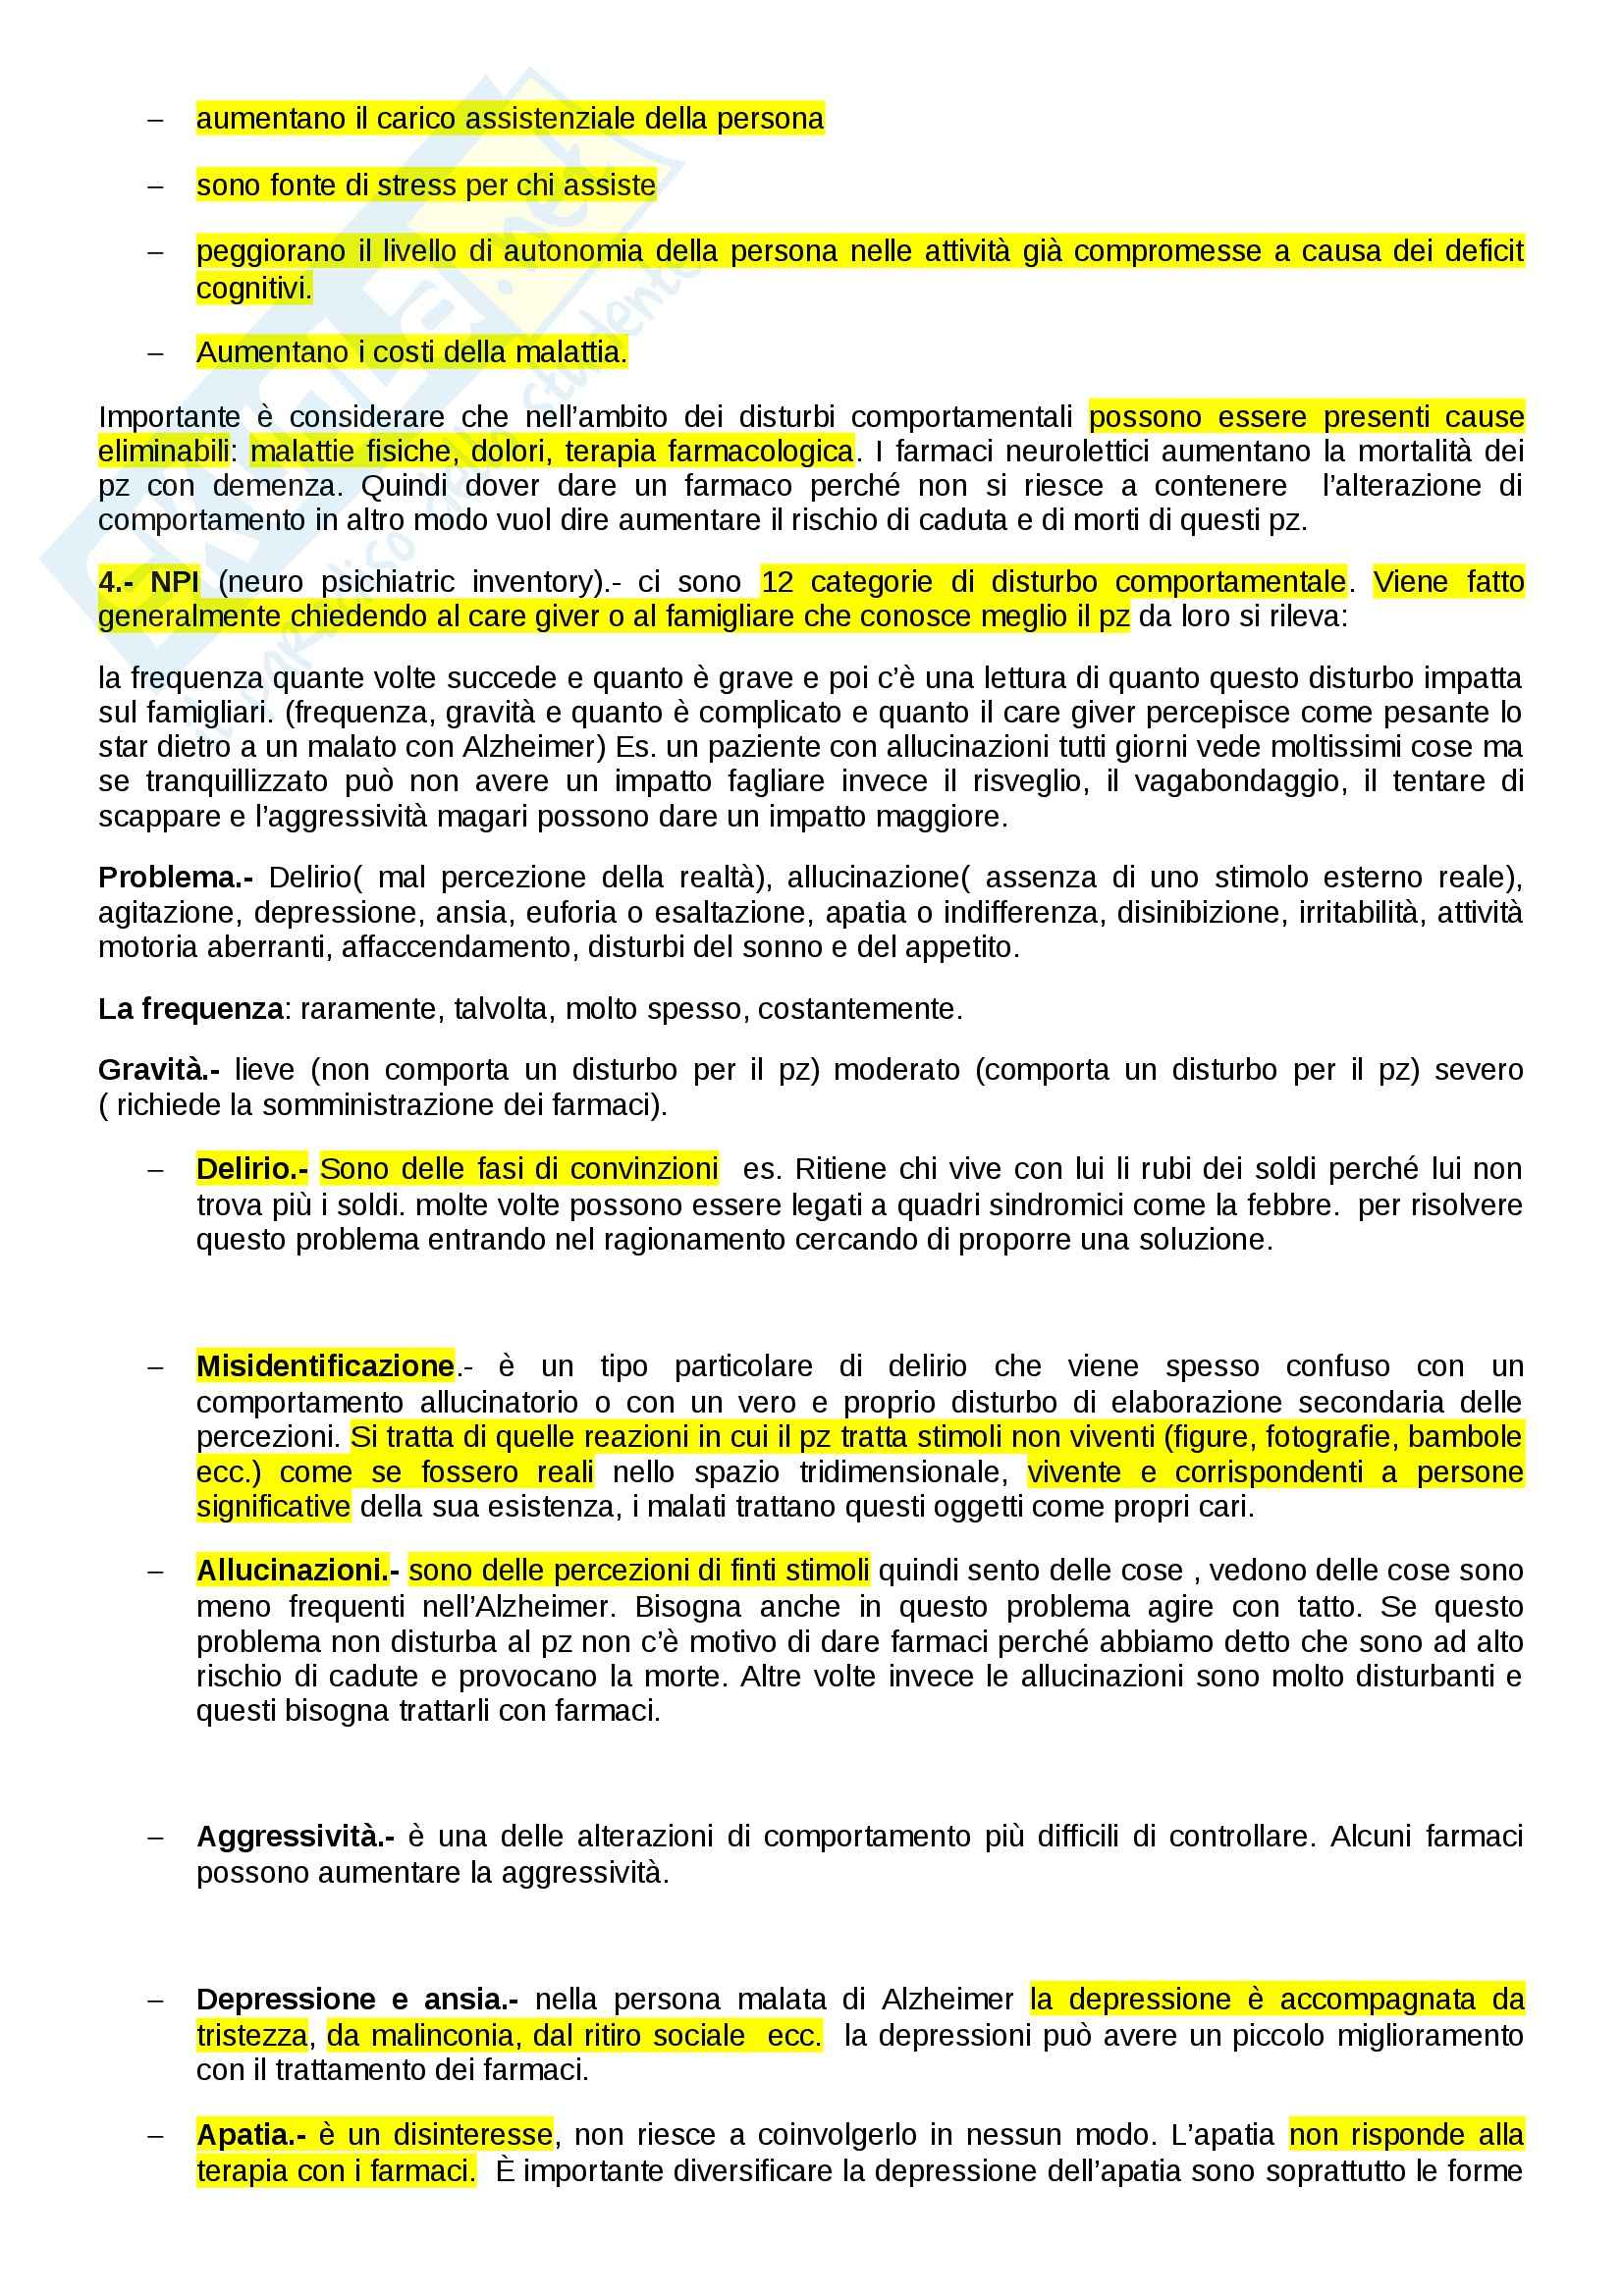 Geriatria - Appunti Pag. 21